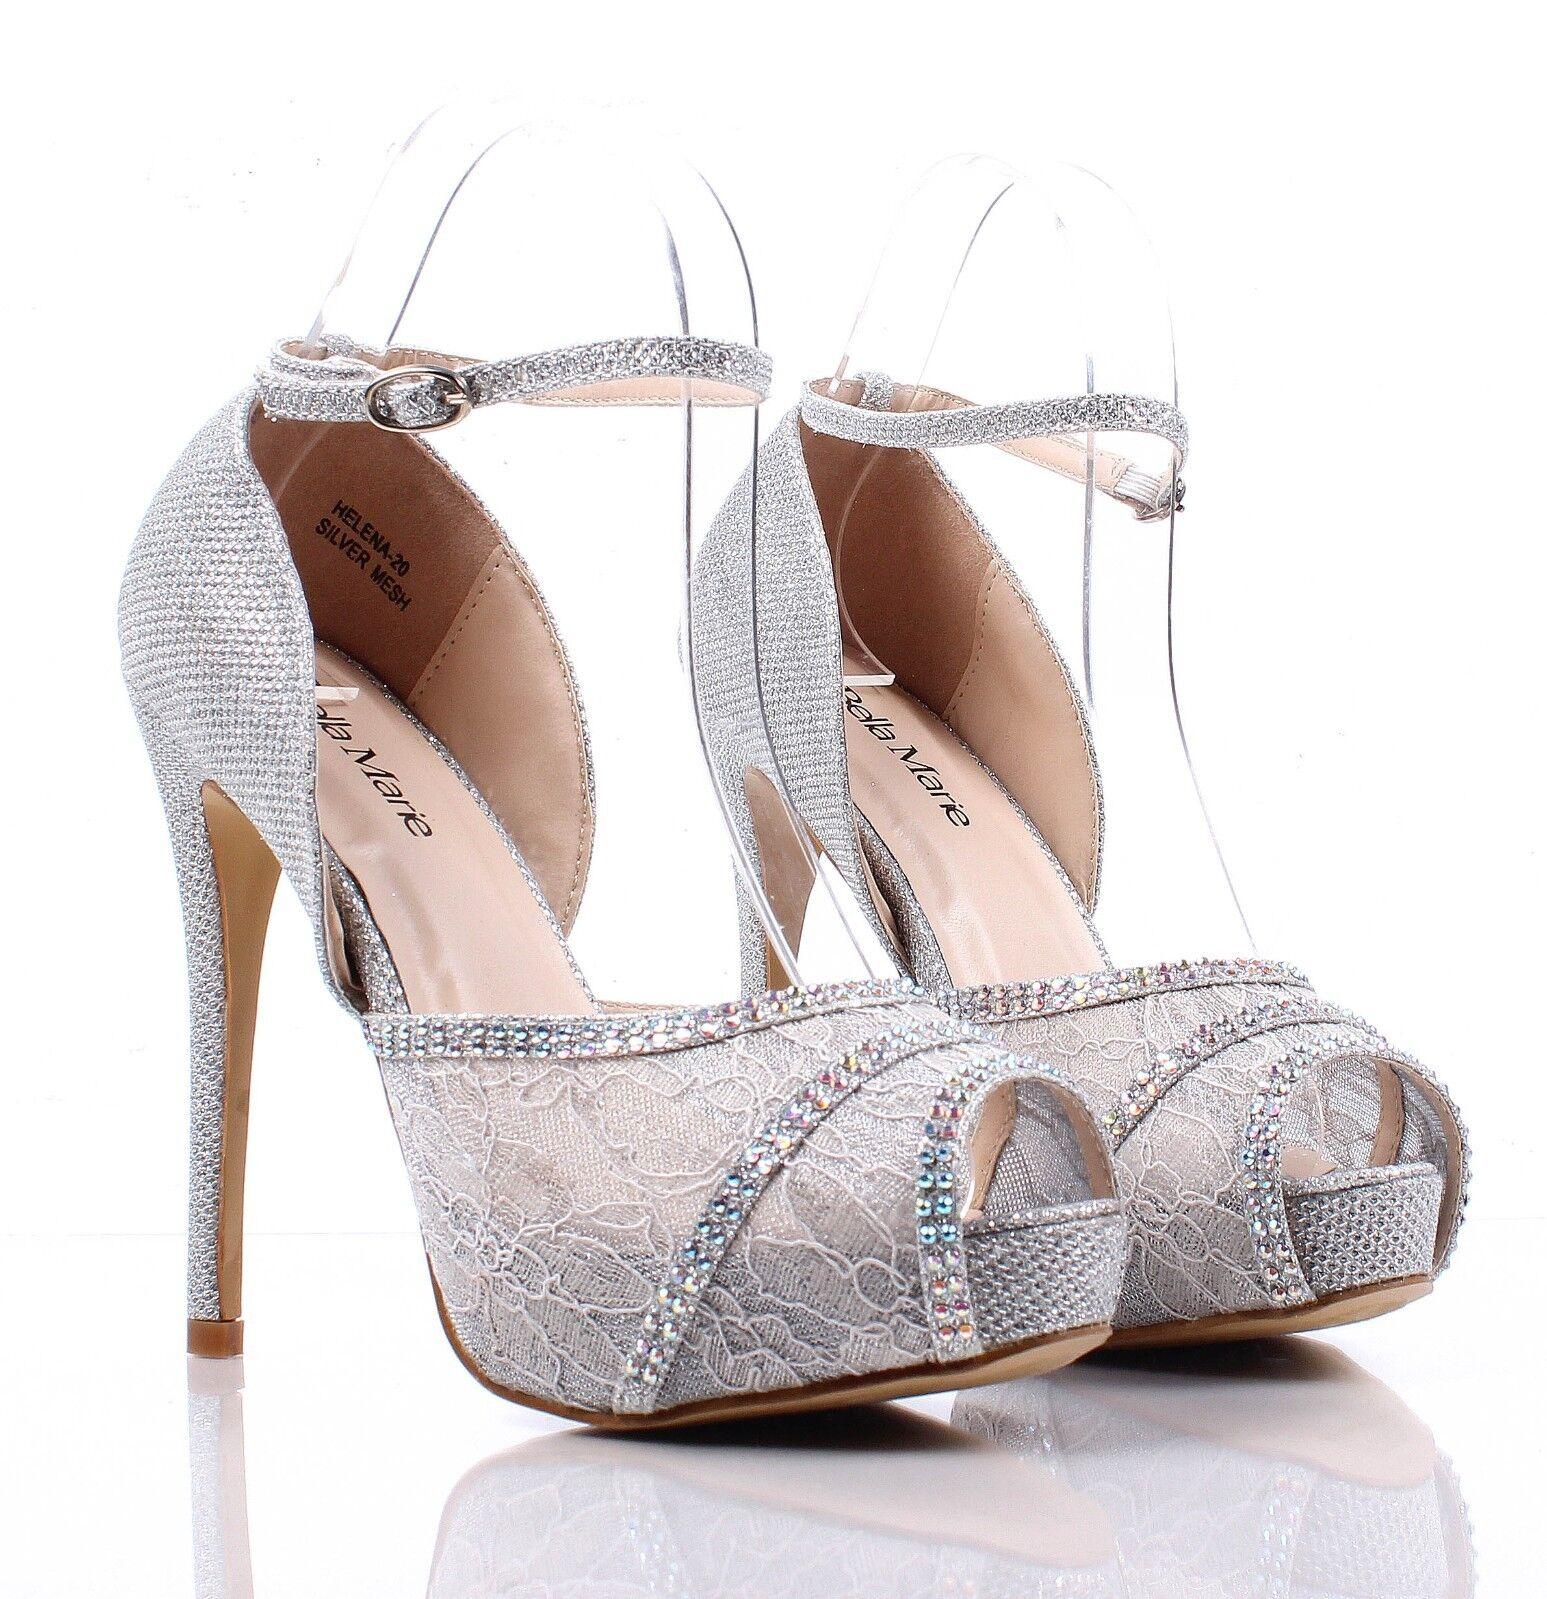 ... nn Open Toe Slingbacks Lace Womens 5'' High Heel Sandals Shoes Size 7